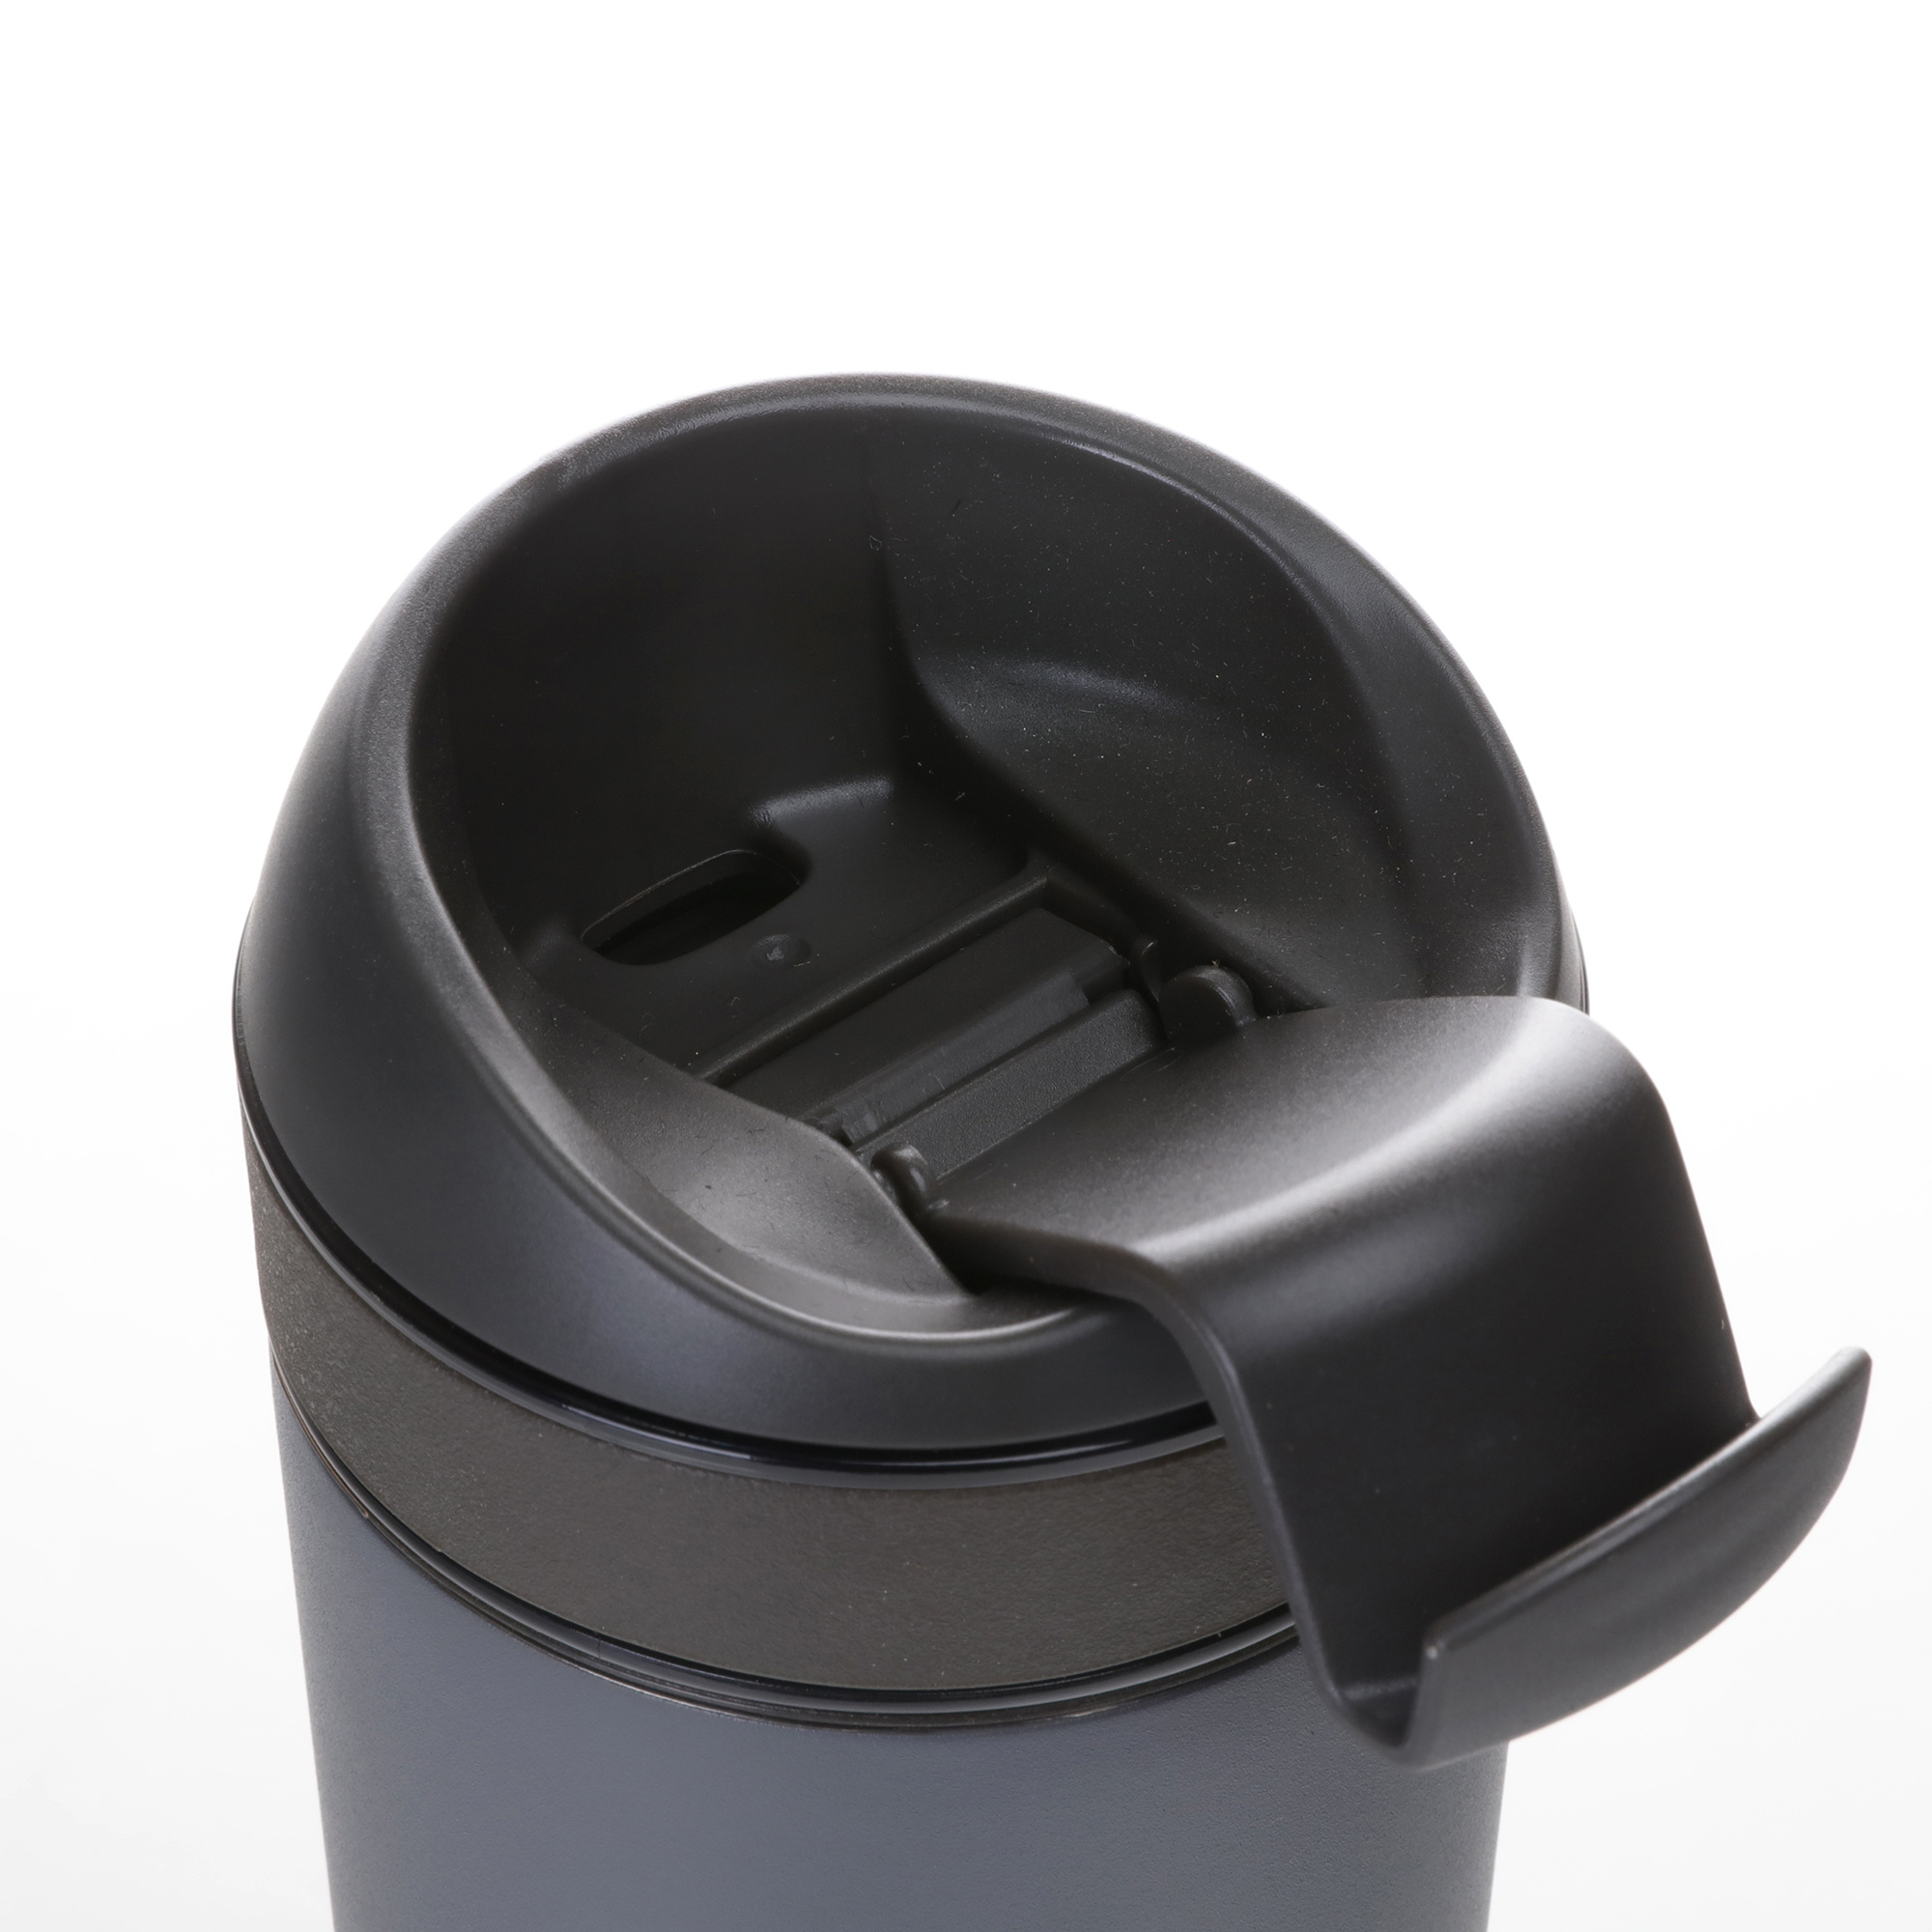 Tasse isolante Recharge Pro™